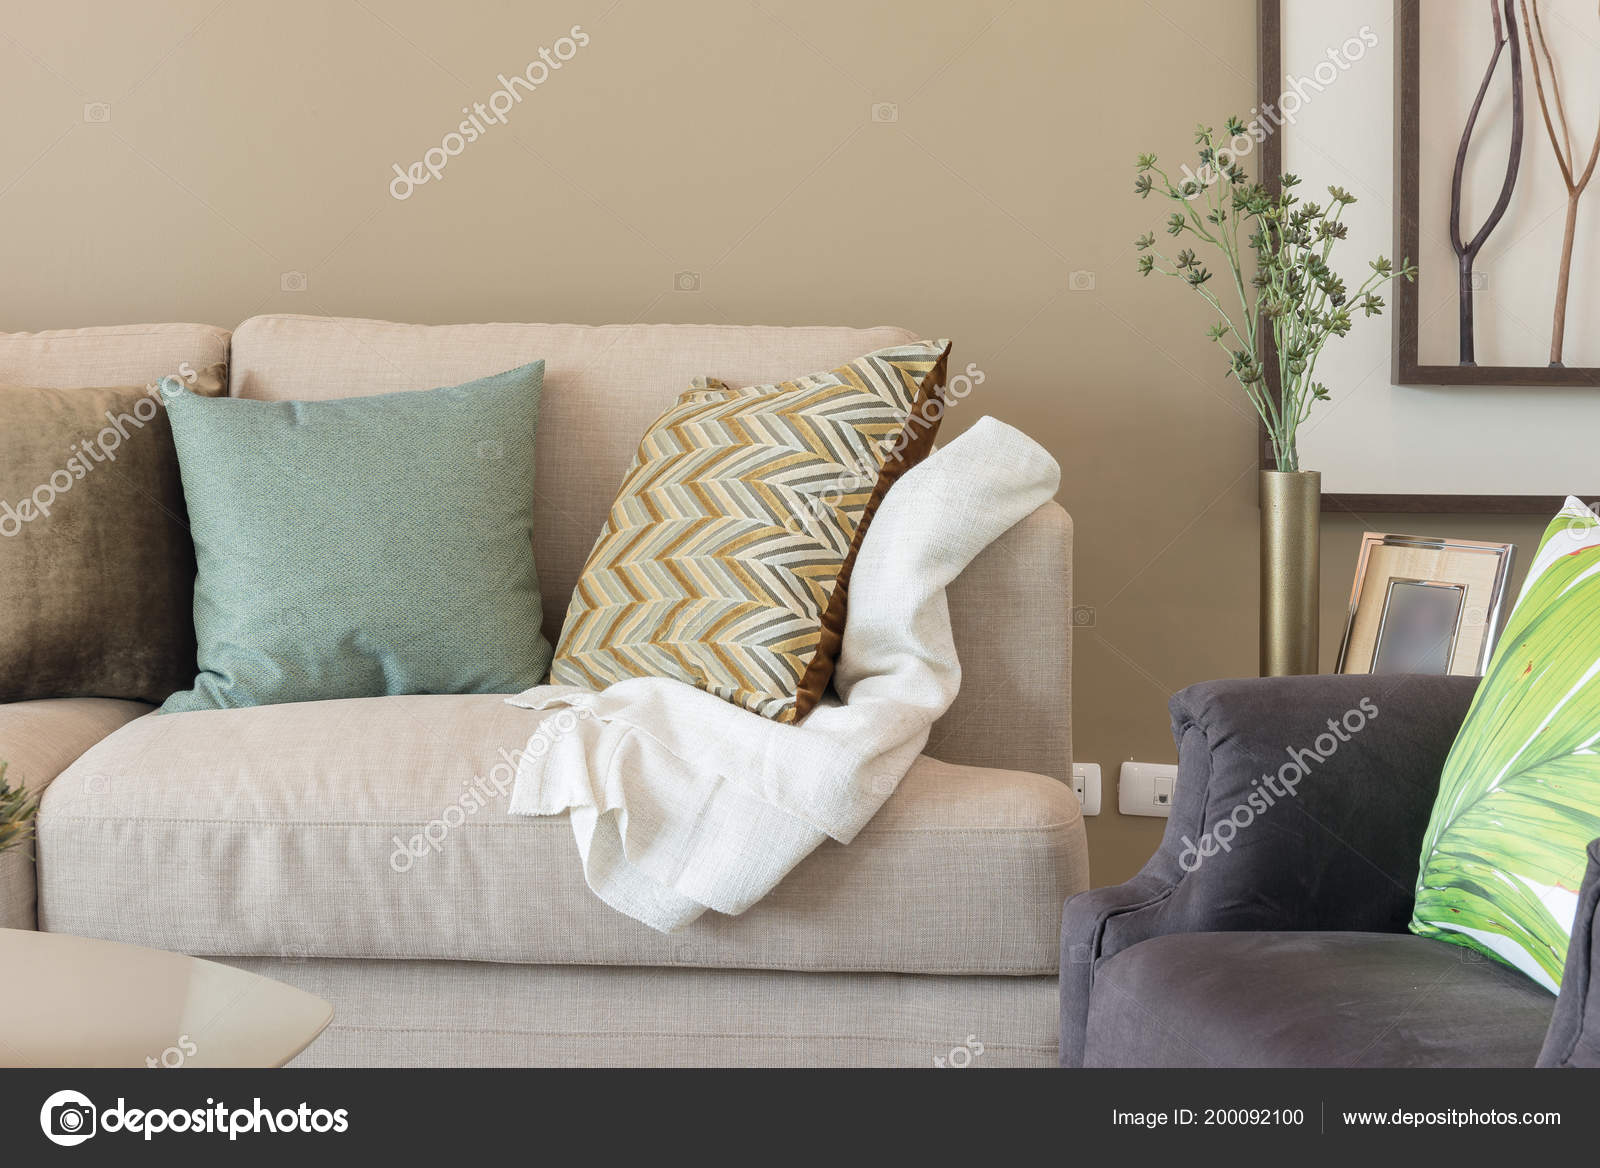 Cozy Living Room Set Pillows Modern Sofa Interior Decoration Design Stock Photo C Khongkitwiriyachan 200092100